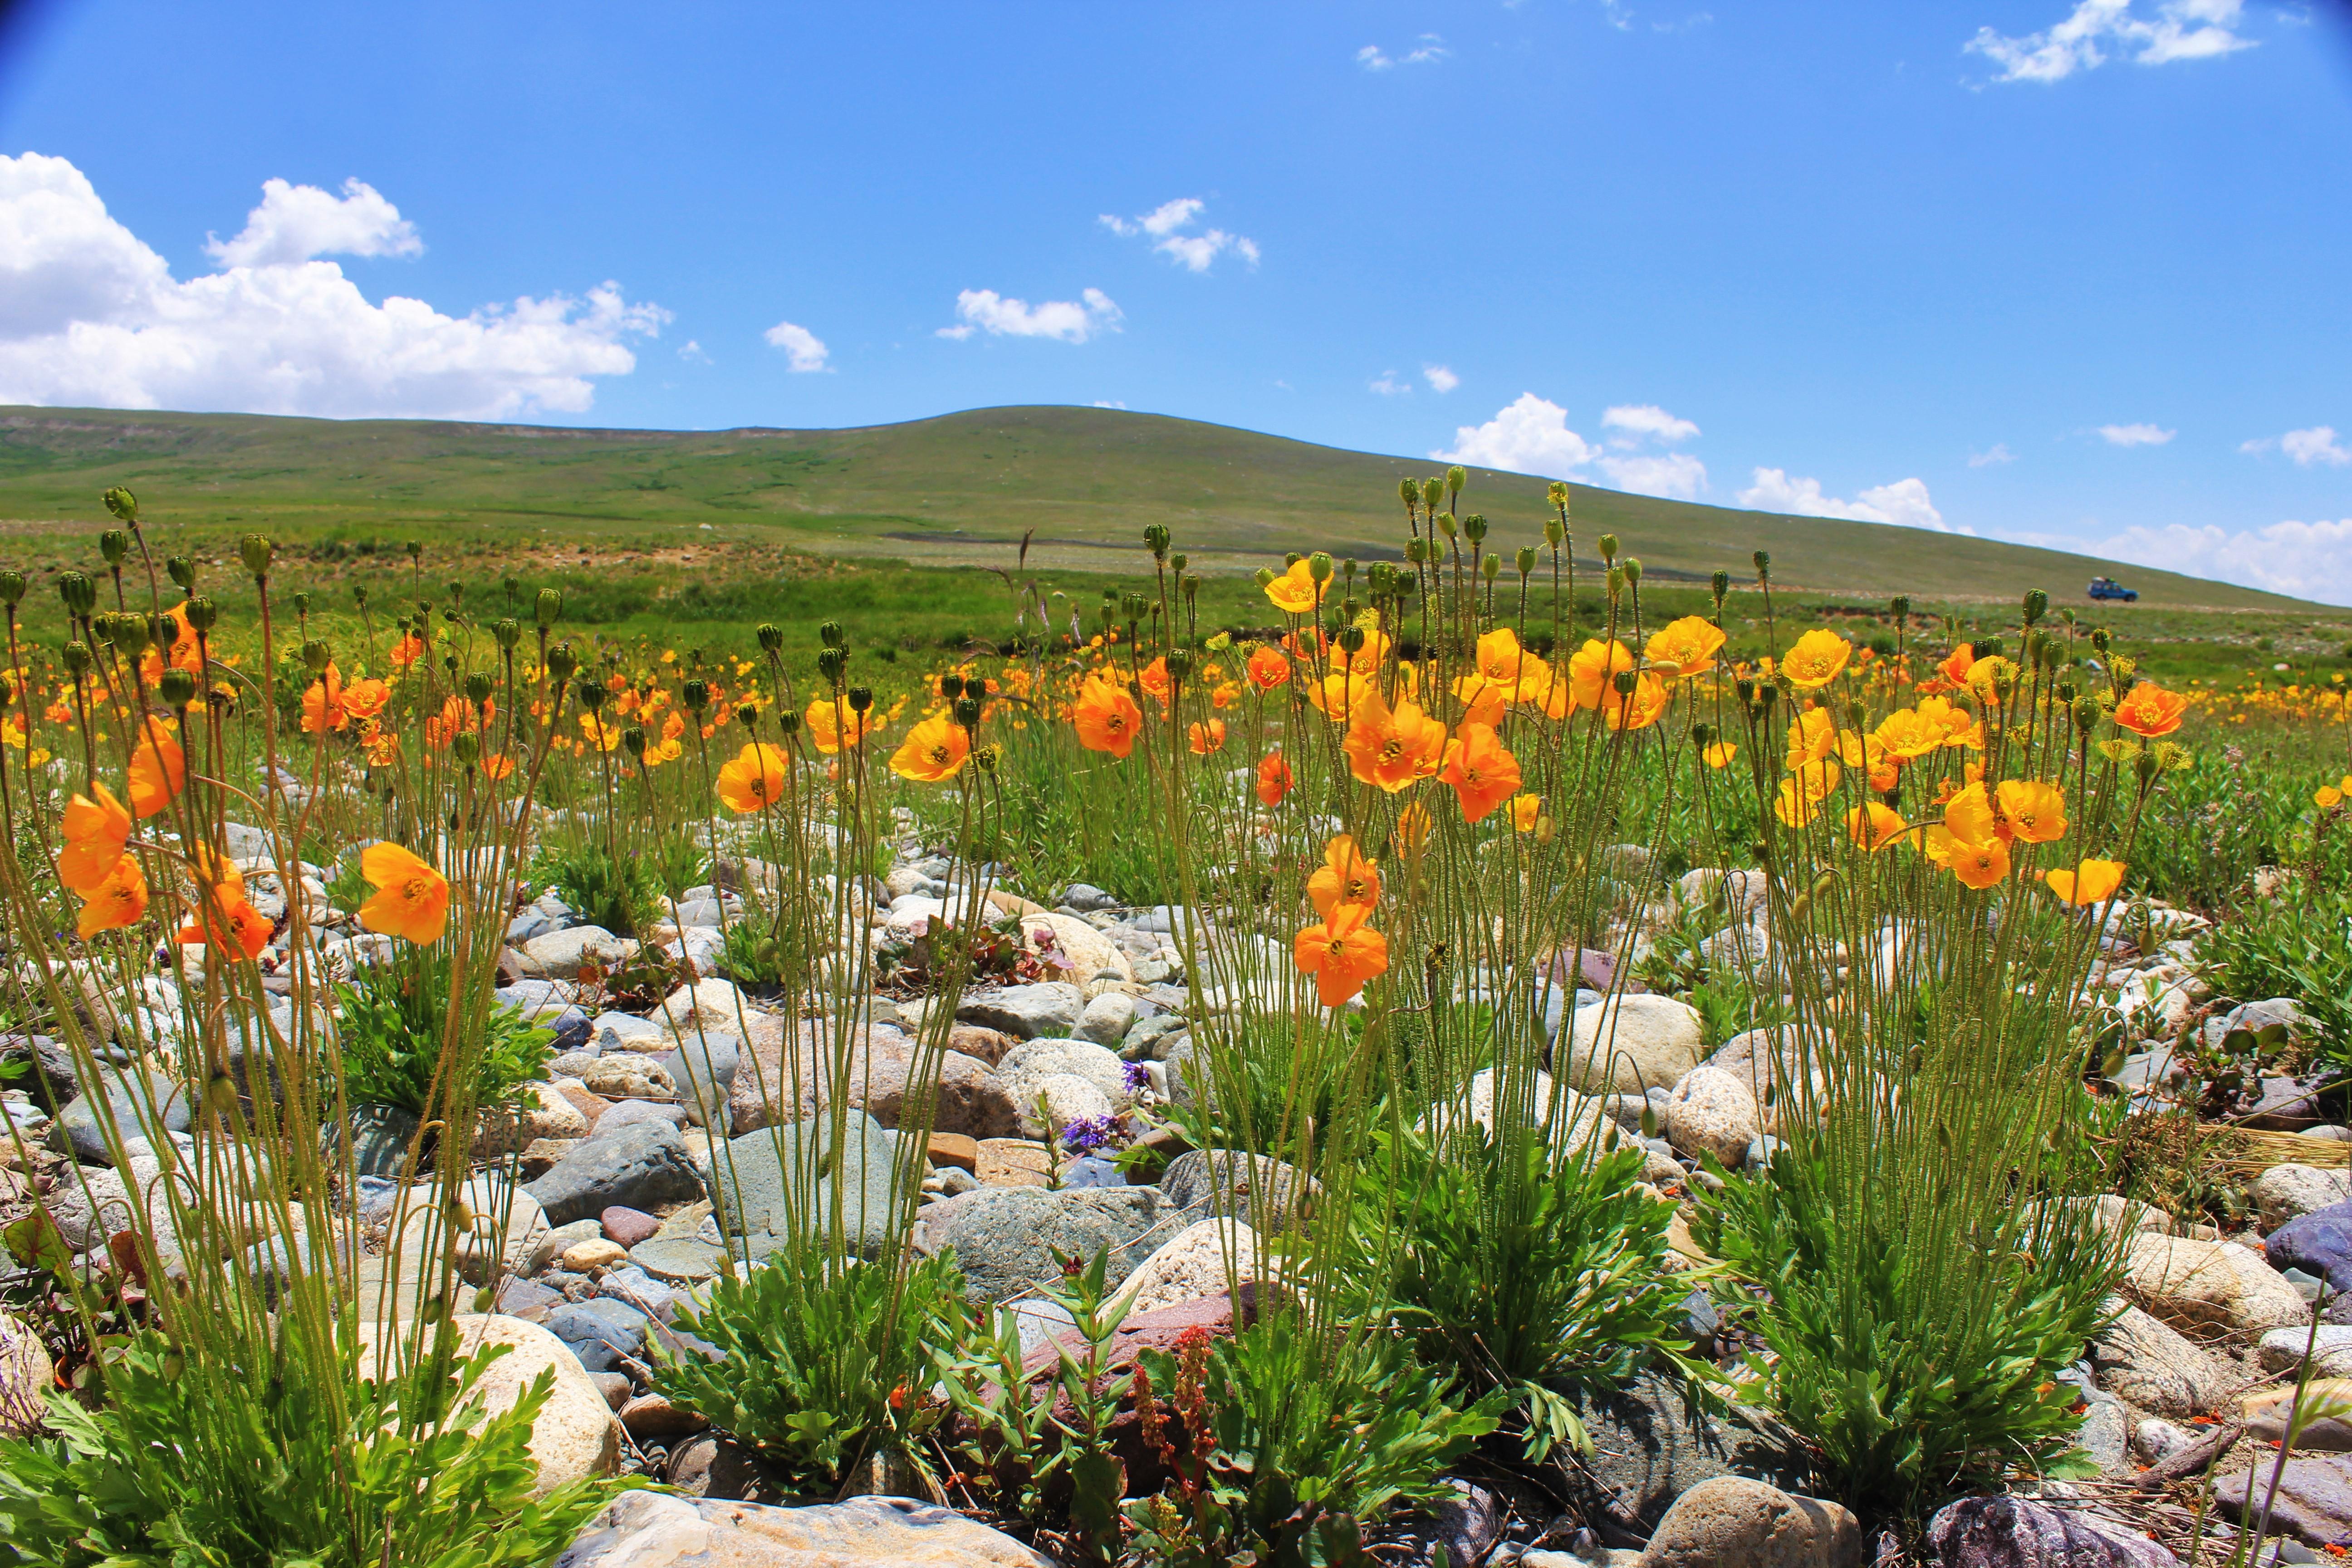 Fileyellow Orange Flowers At Deosai National Park Pakistang